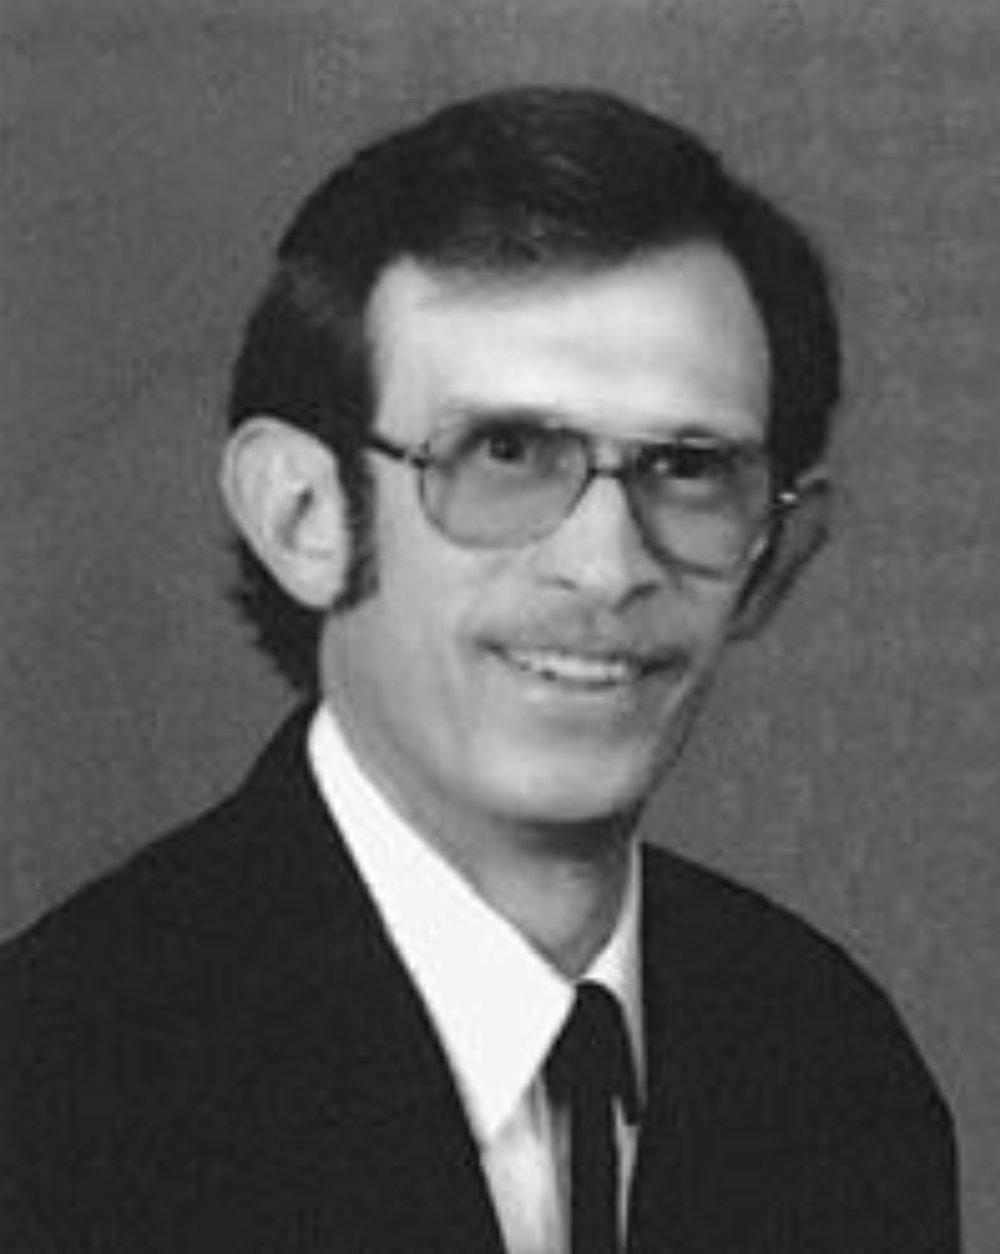 CARL G. HOGOBOOM